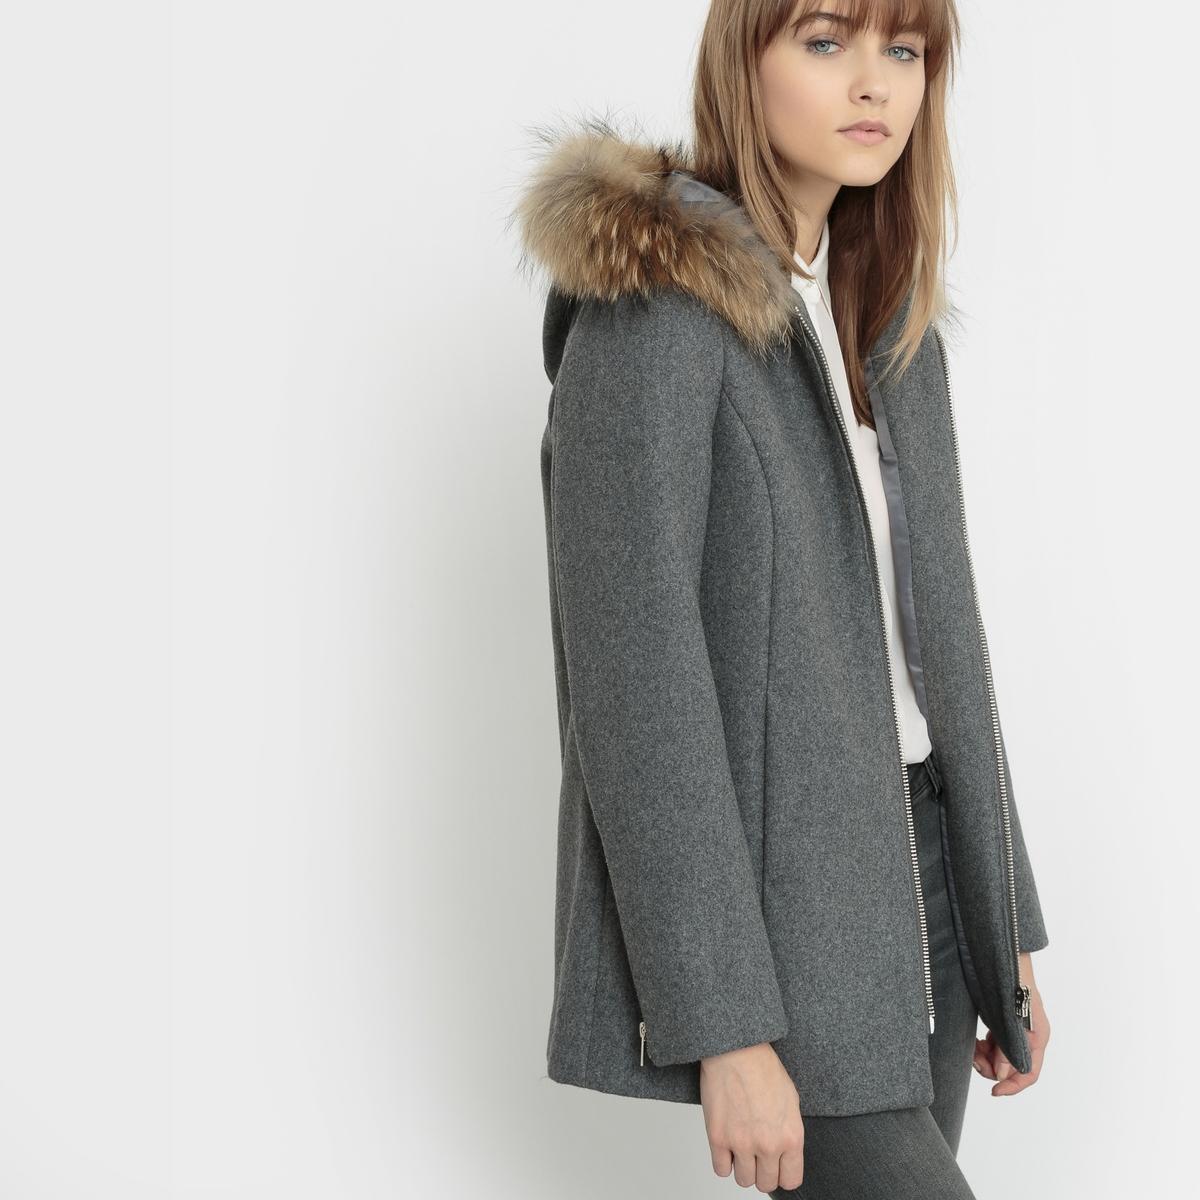 Пальто из шерстяного драпа LAURAМарка : KARL MARC JOHNСостав : 80% шерсти 20% полиэстера<br><br>Цвет: серый<br>Размер: S.M